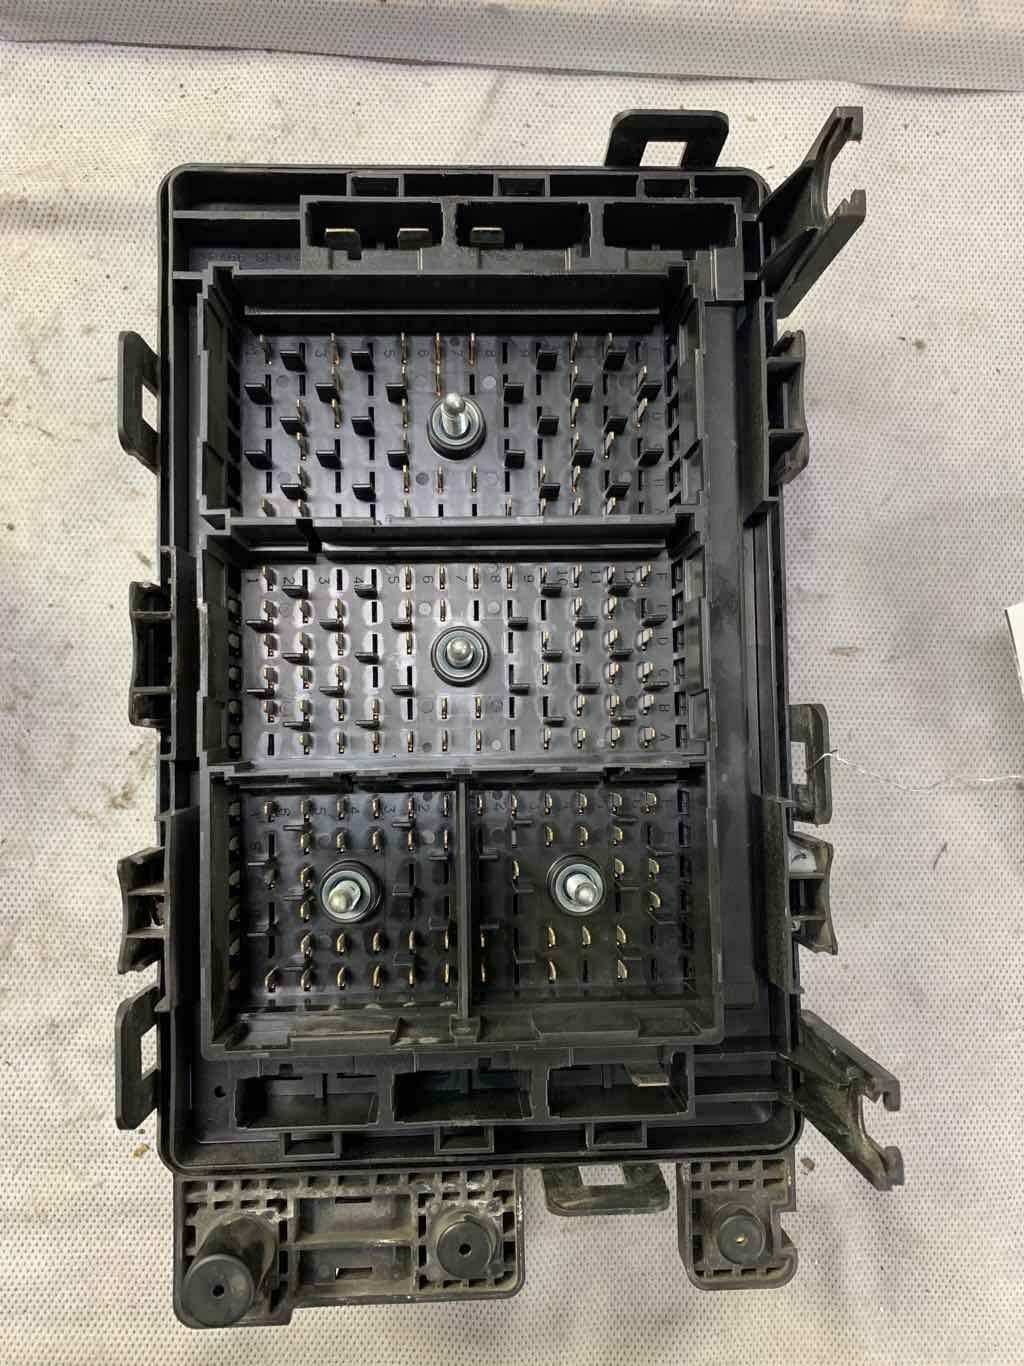 Oem 02 03 Gmc Envoy Engine Fuse Box Tested M539 Wj1c5